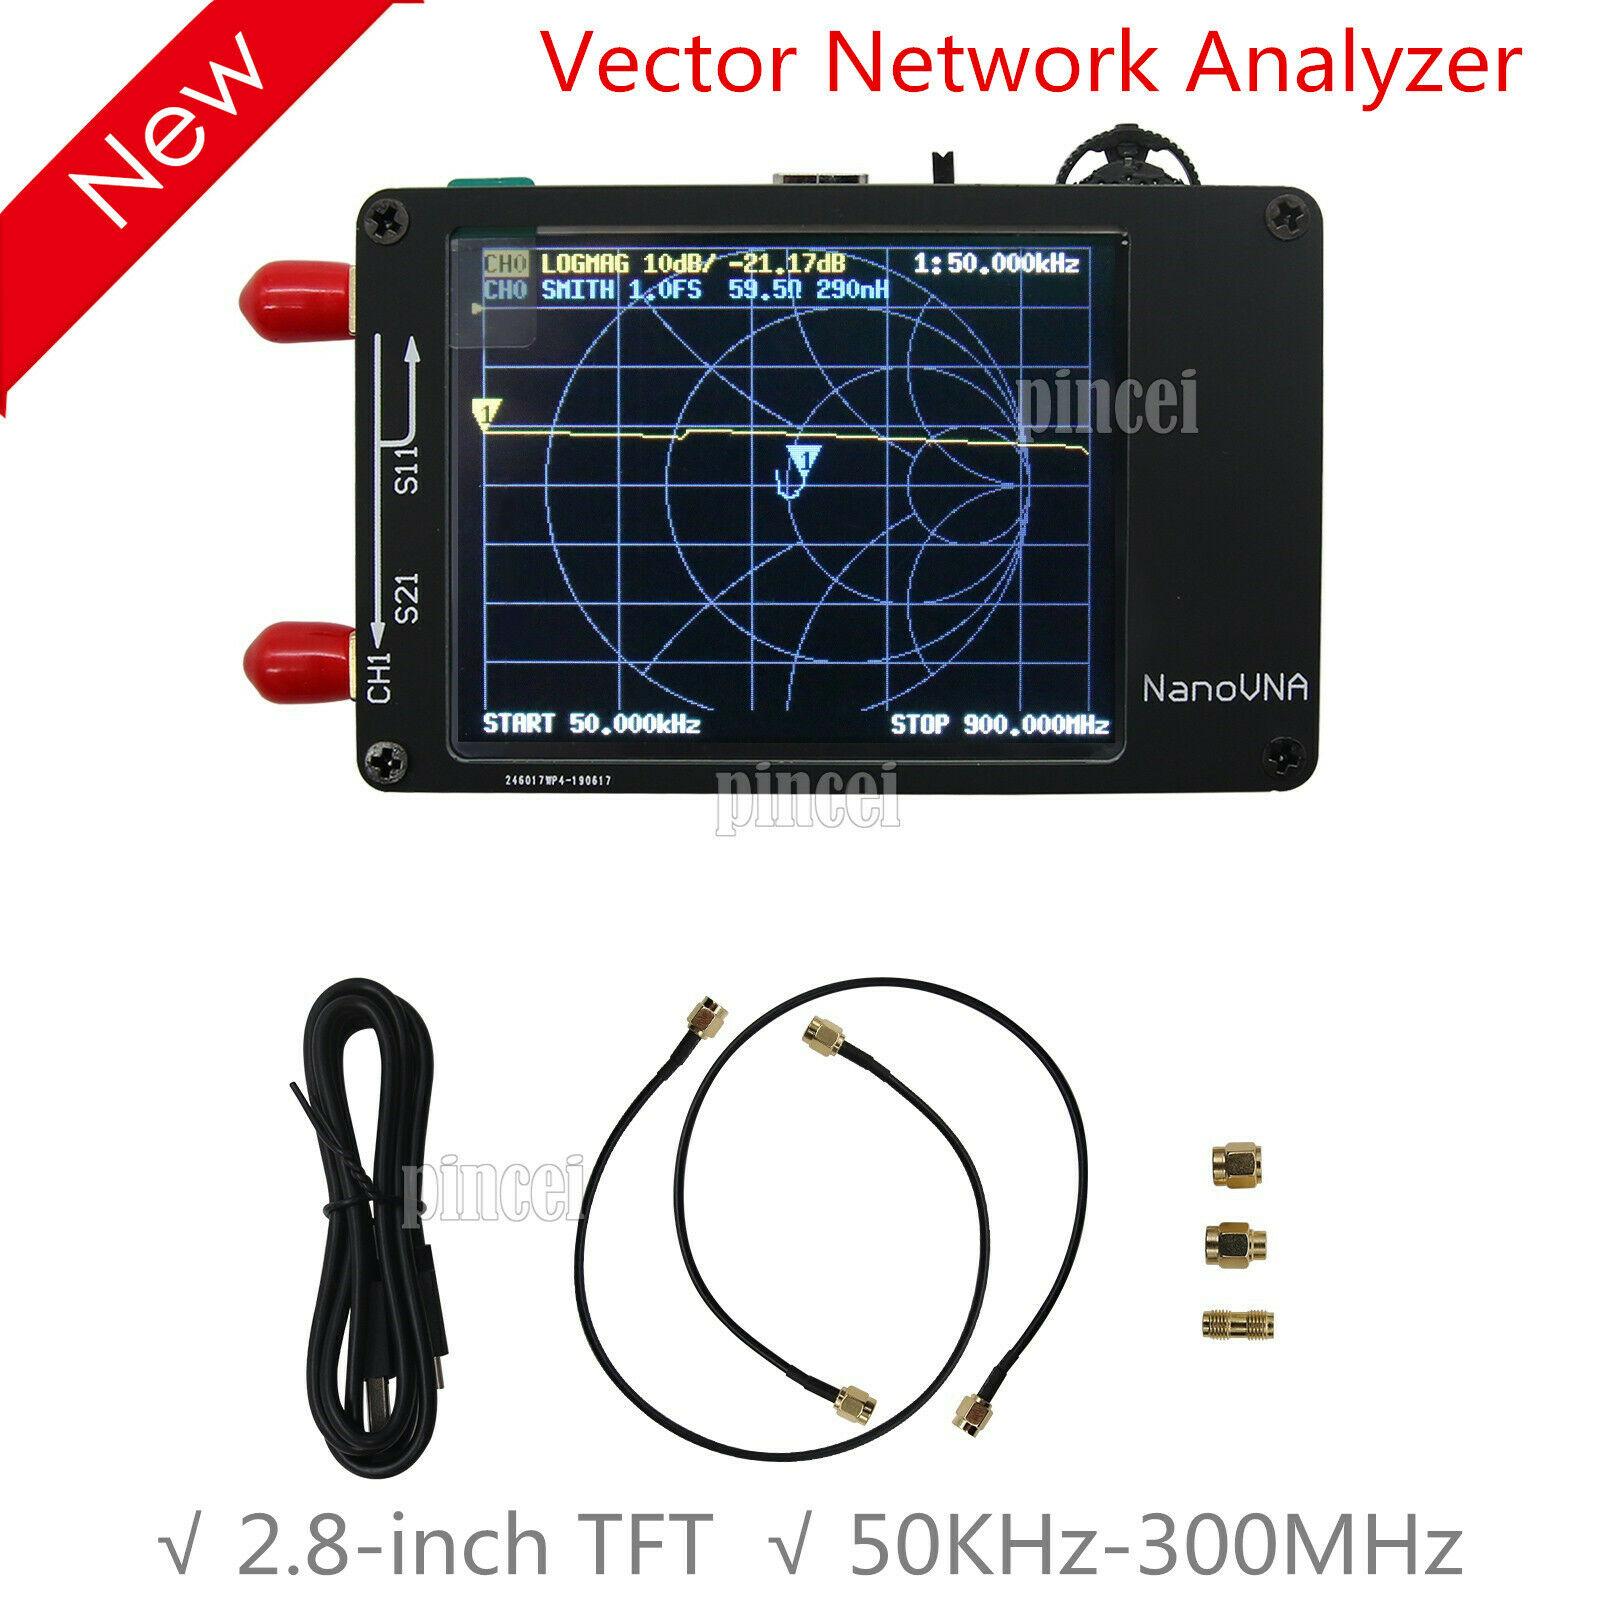 top 10 uhf vhf analyzer brands and get free shipping - k94381b1